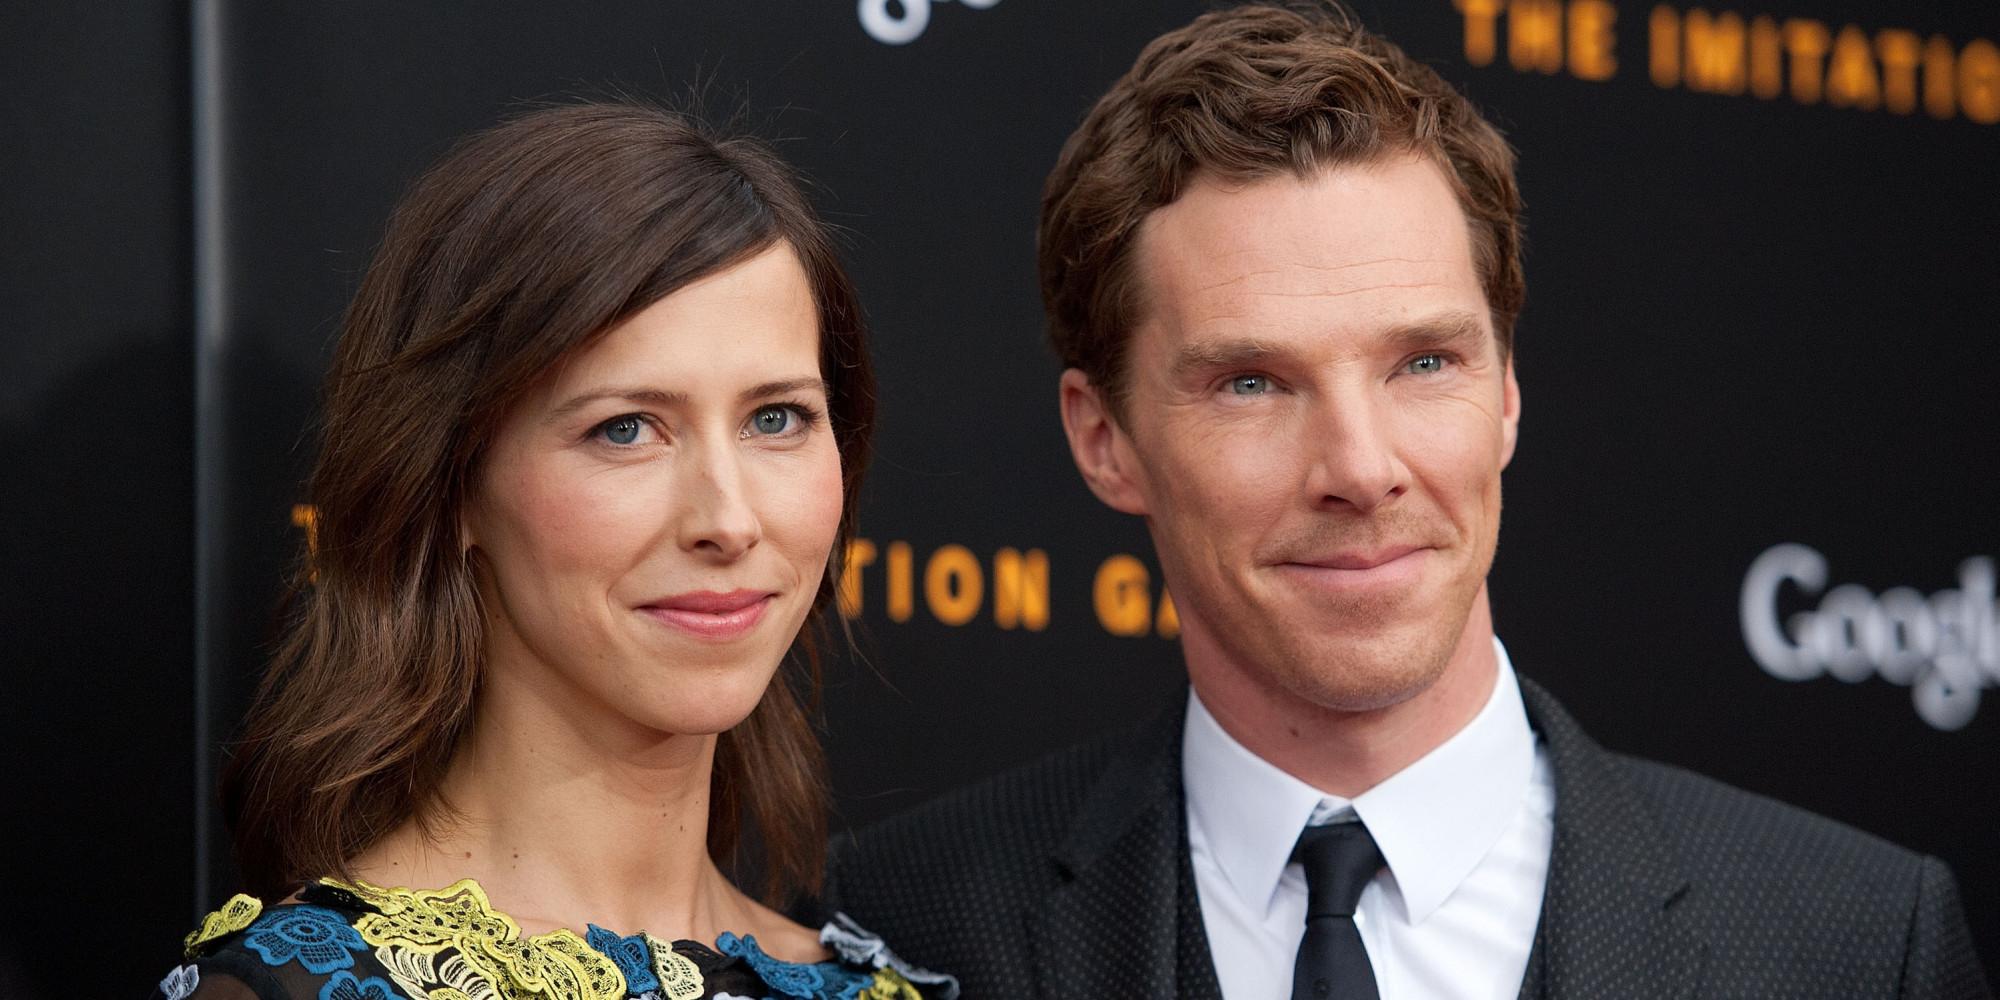 Benedict-Cumberbatch-et-Sophie-Hunter-se-sont-dit-oui